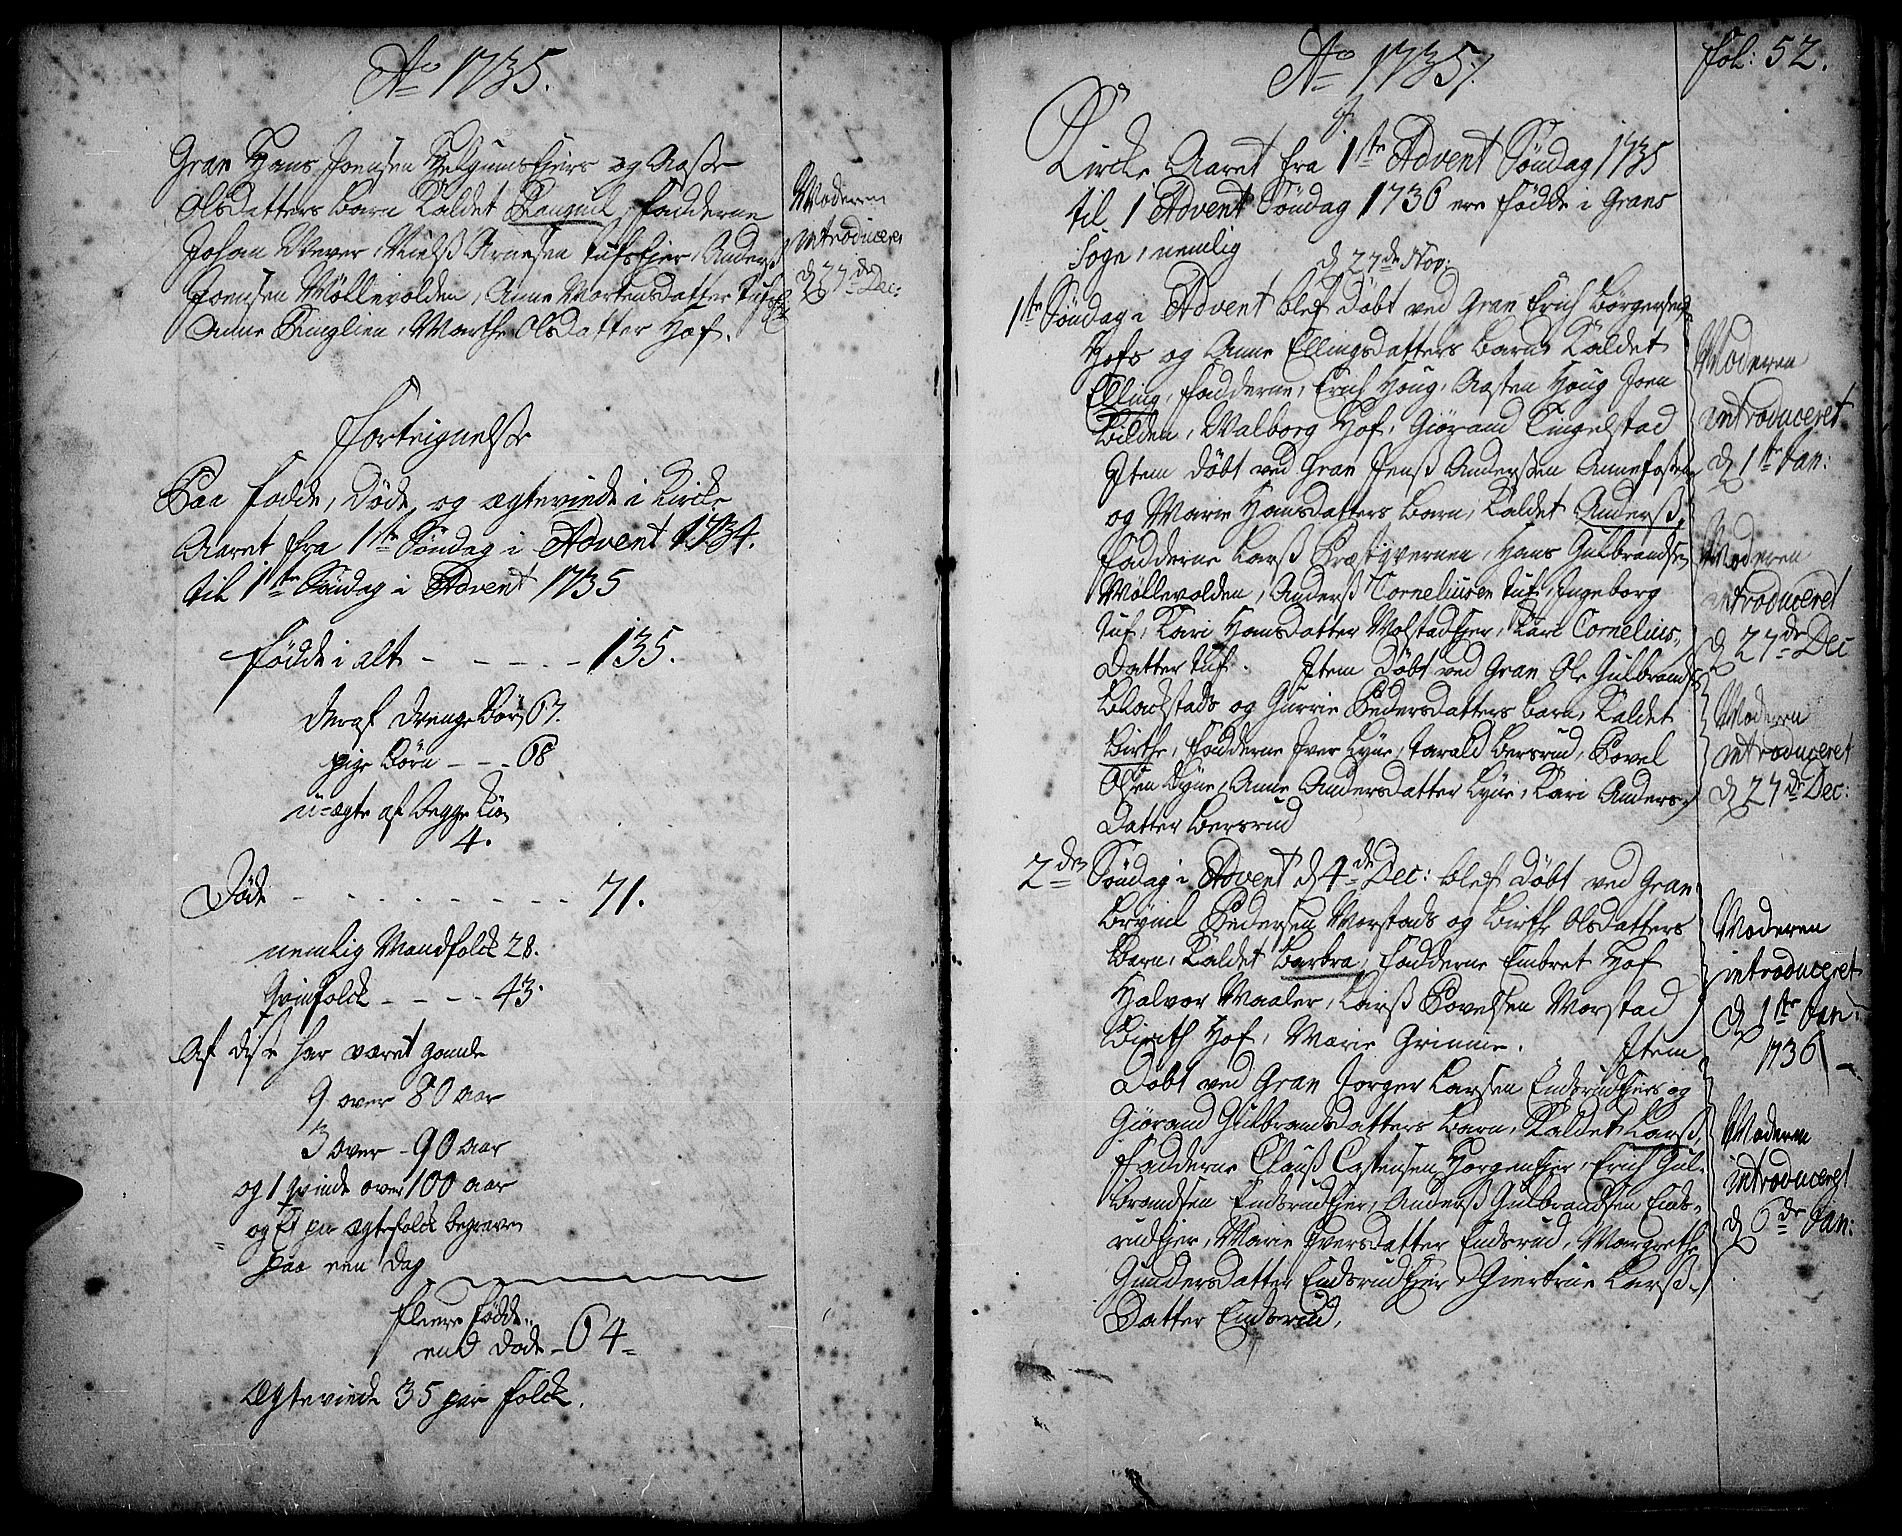 SAH, Gran prestekontor, Ministerialbok nr. 2, 1732-1744, s. 52